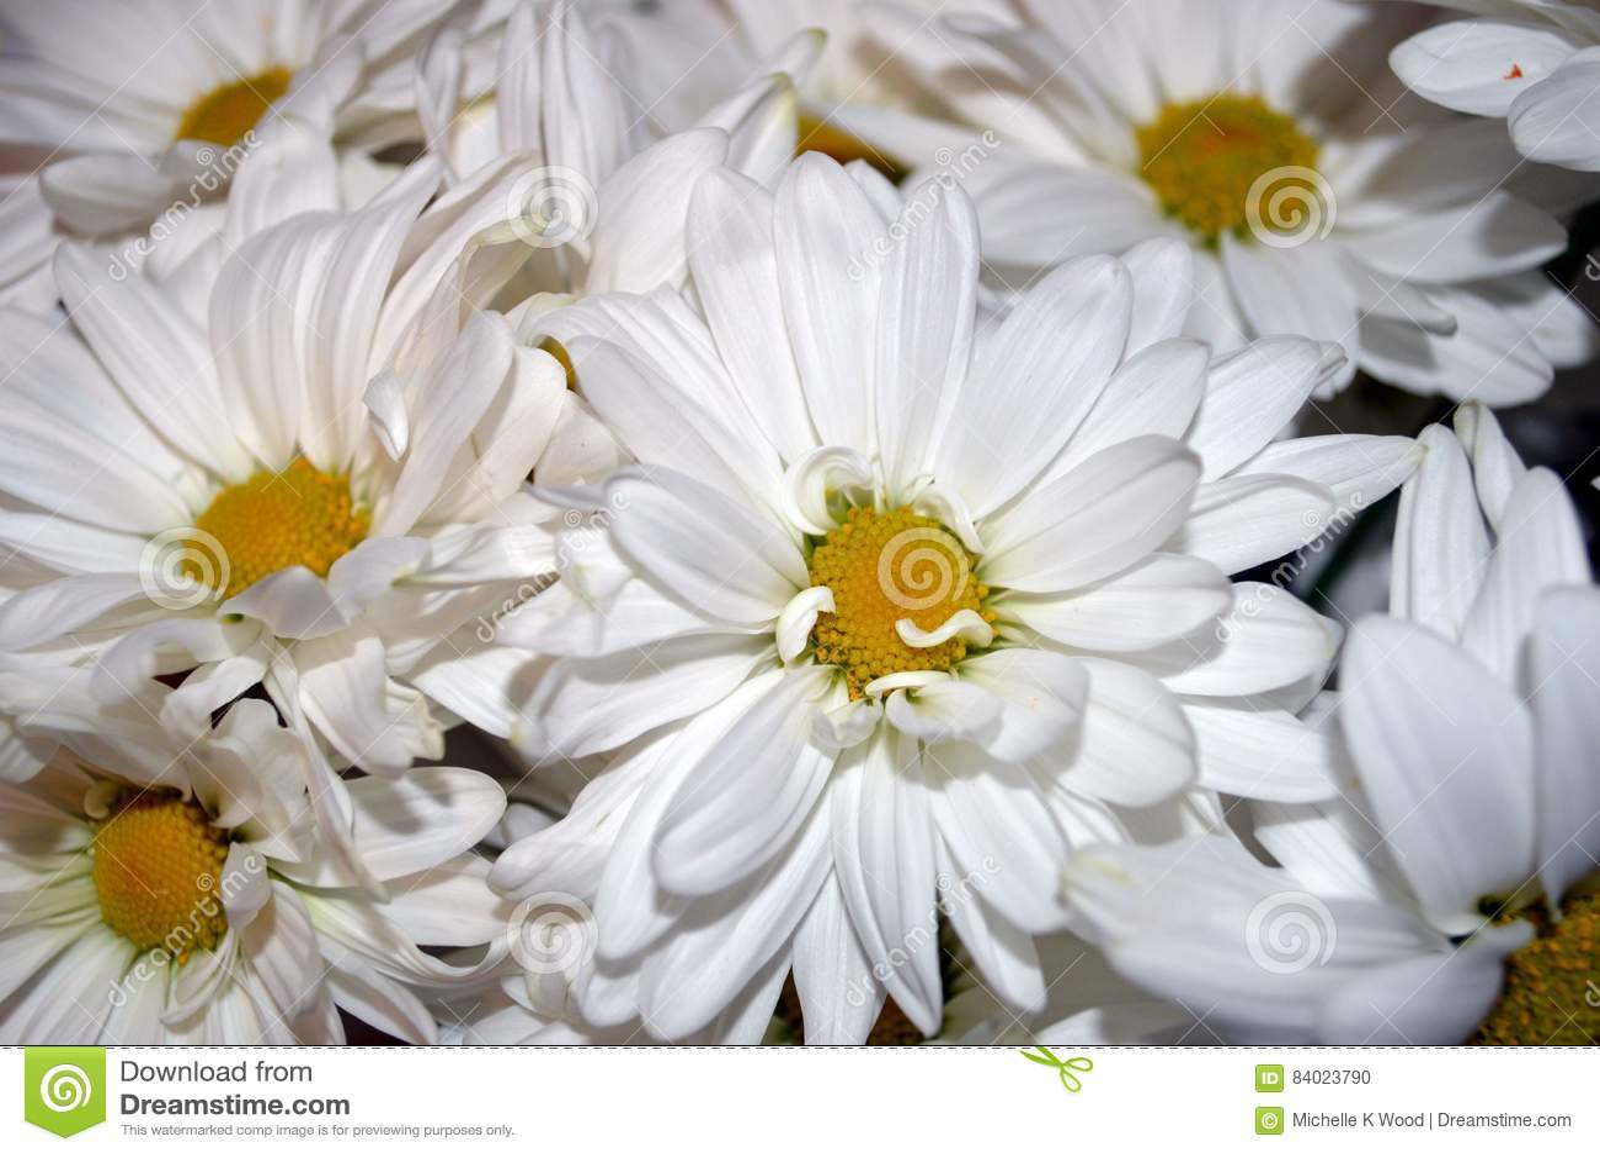 White double daisy close up stock photo image of yellow download white double daisy close up stock photo image of yellow thetinyphotographer 84023790 izmirmasajfo